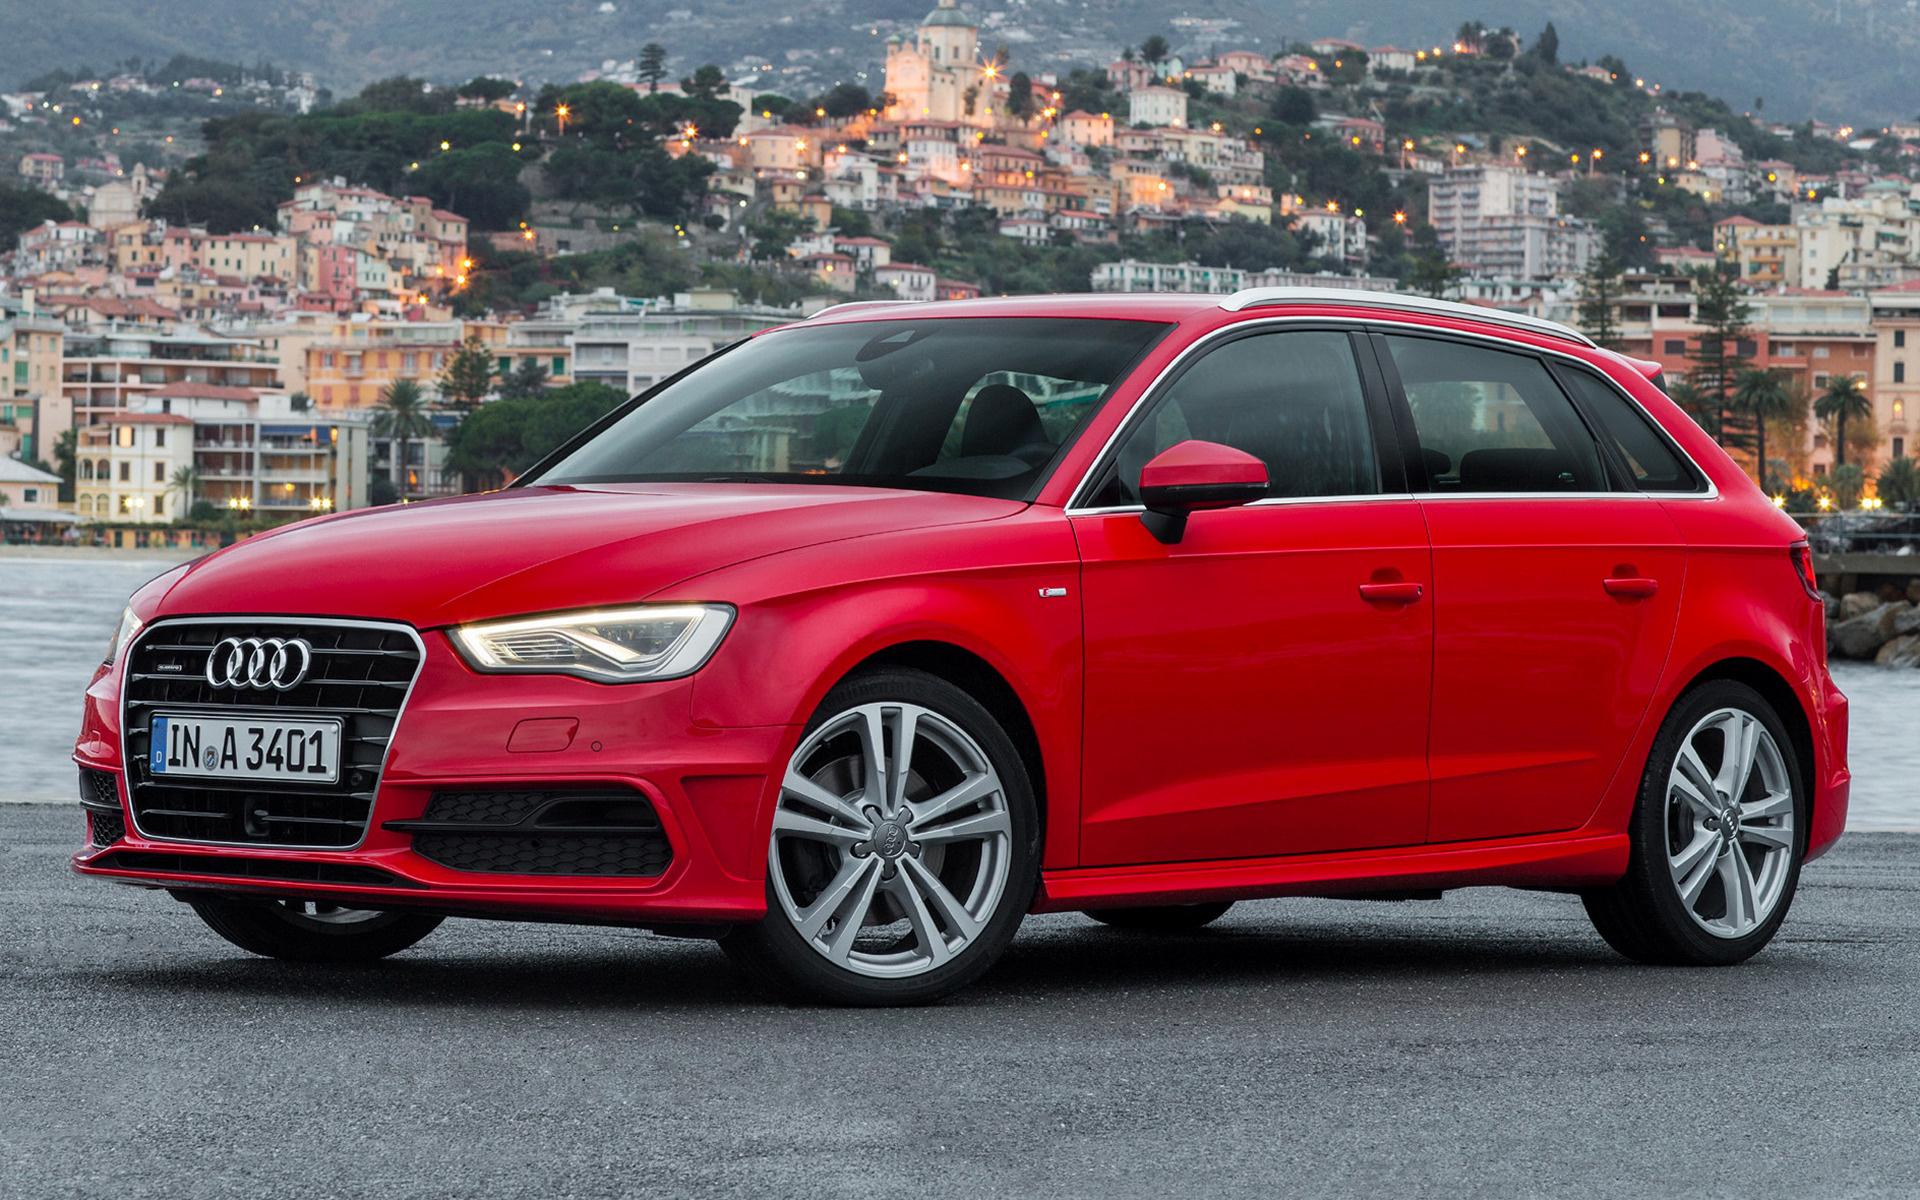 Kelebihan Audi A3 Sportback 2012 Murah Berkualitas